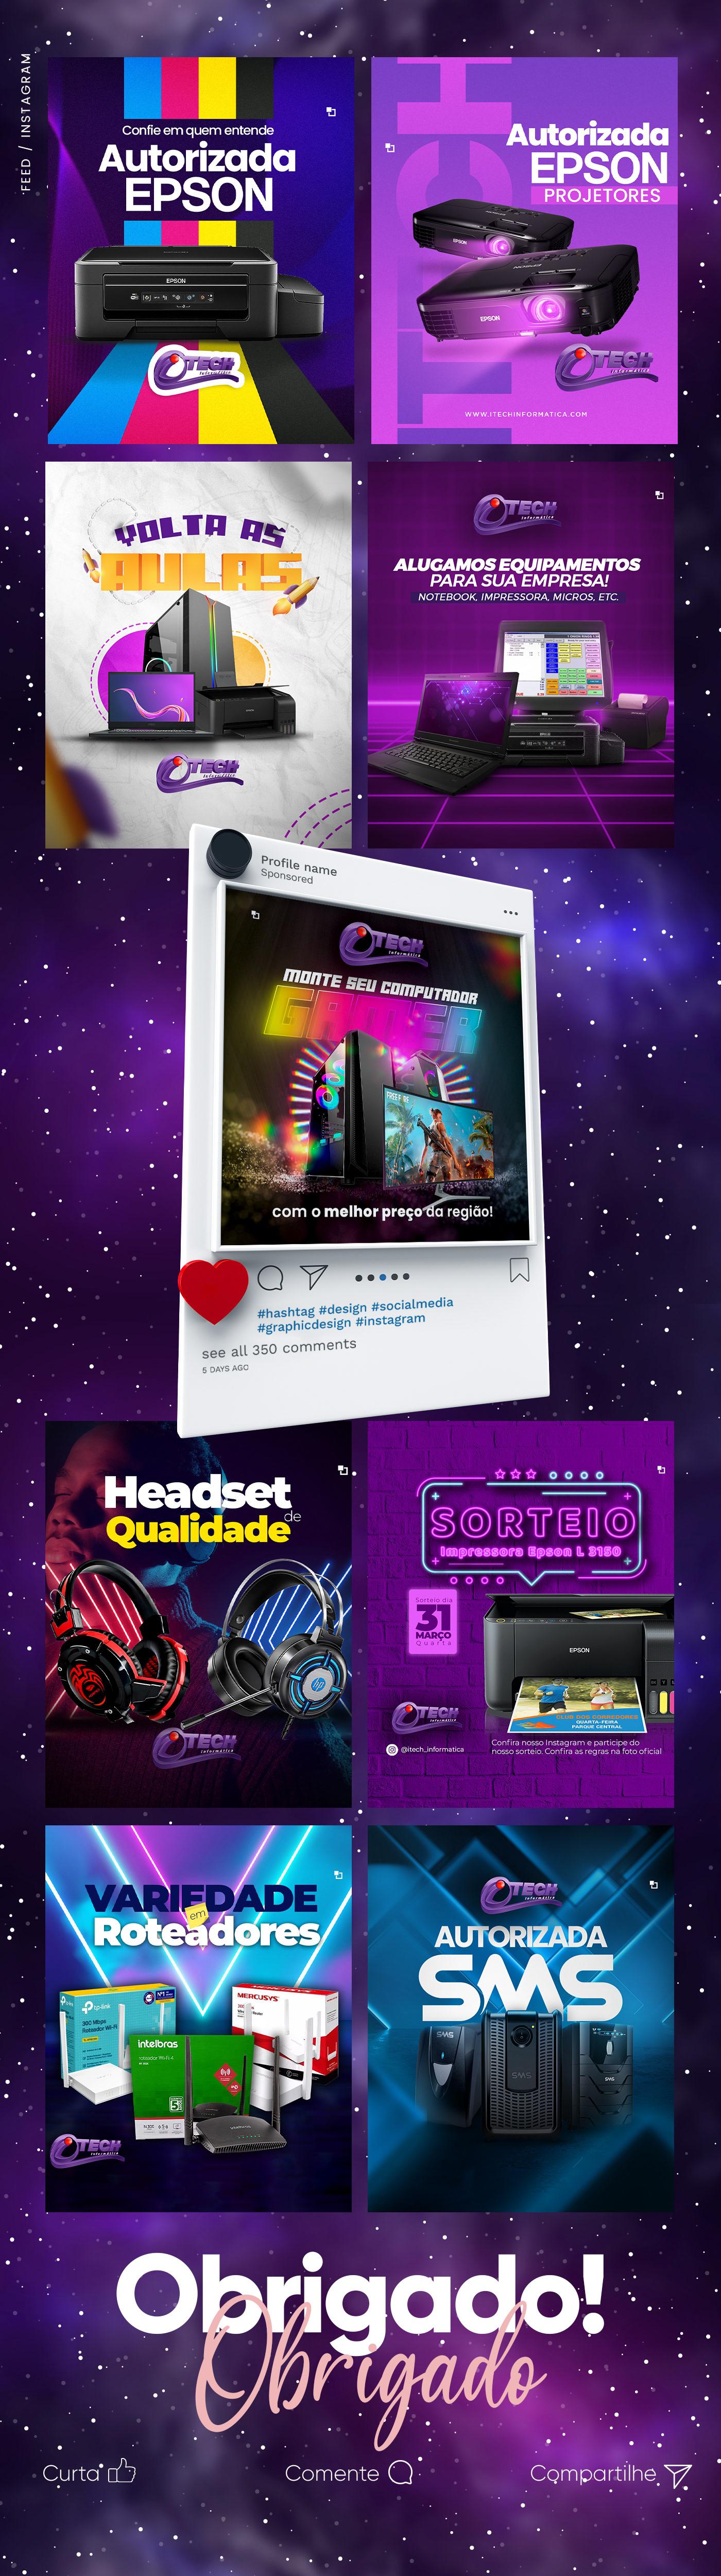 Image may contain: screenshot and poster